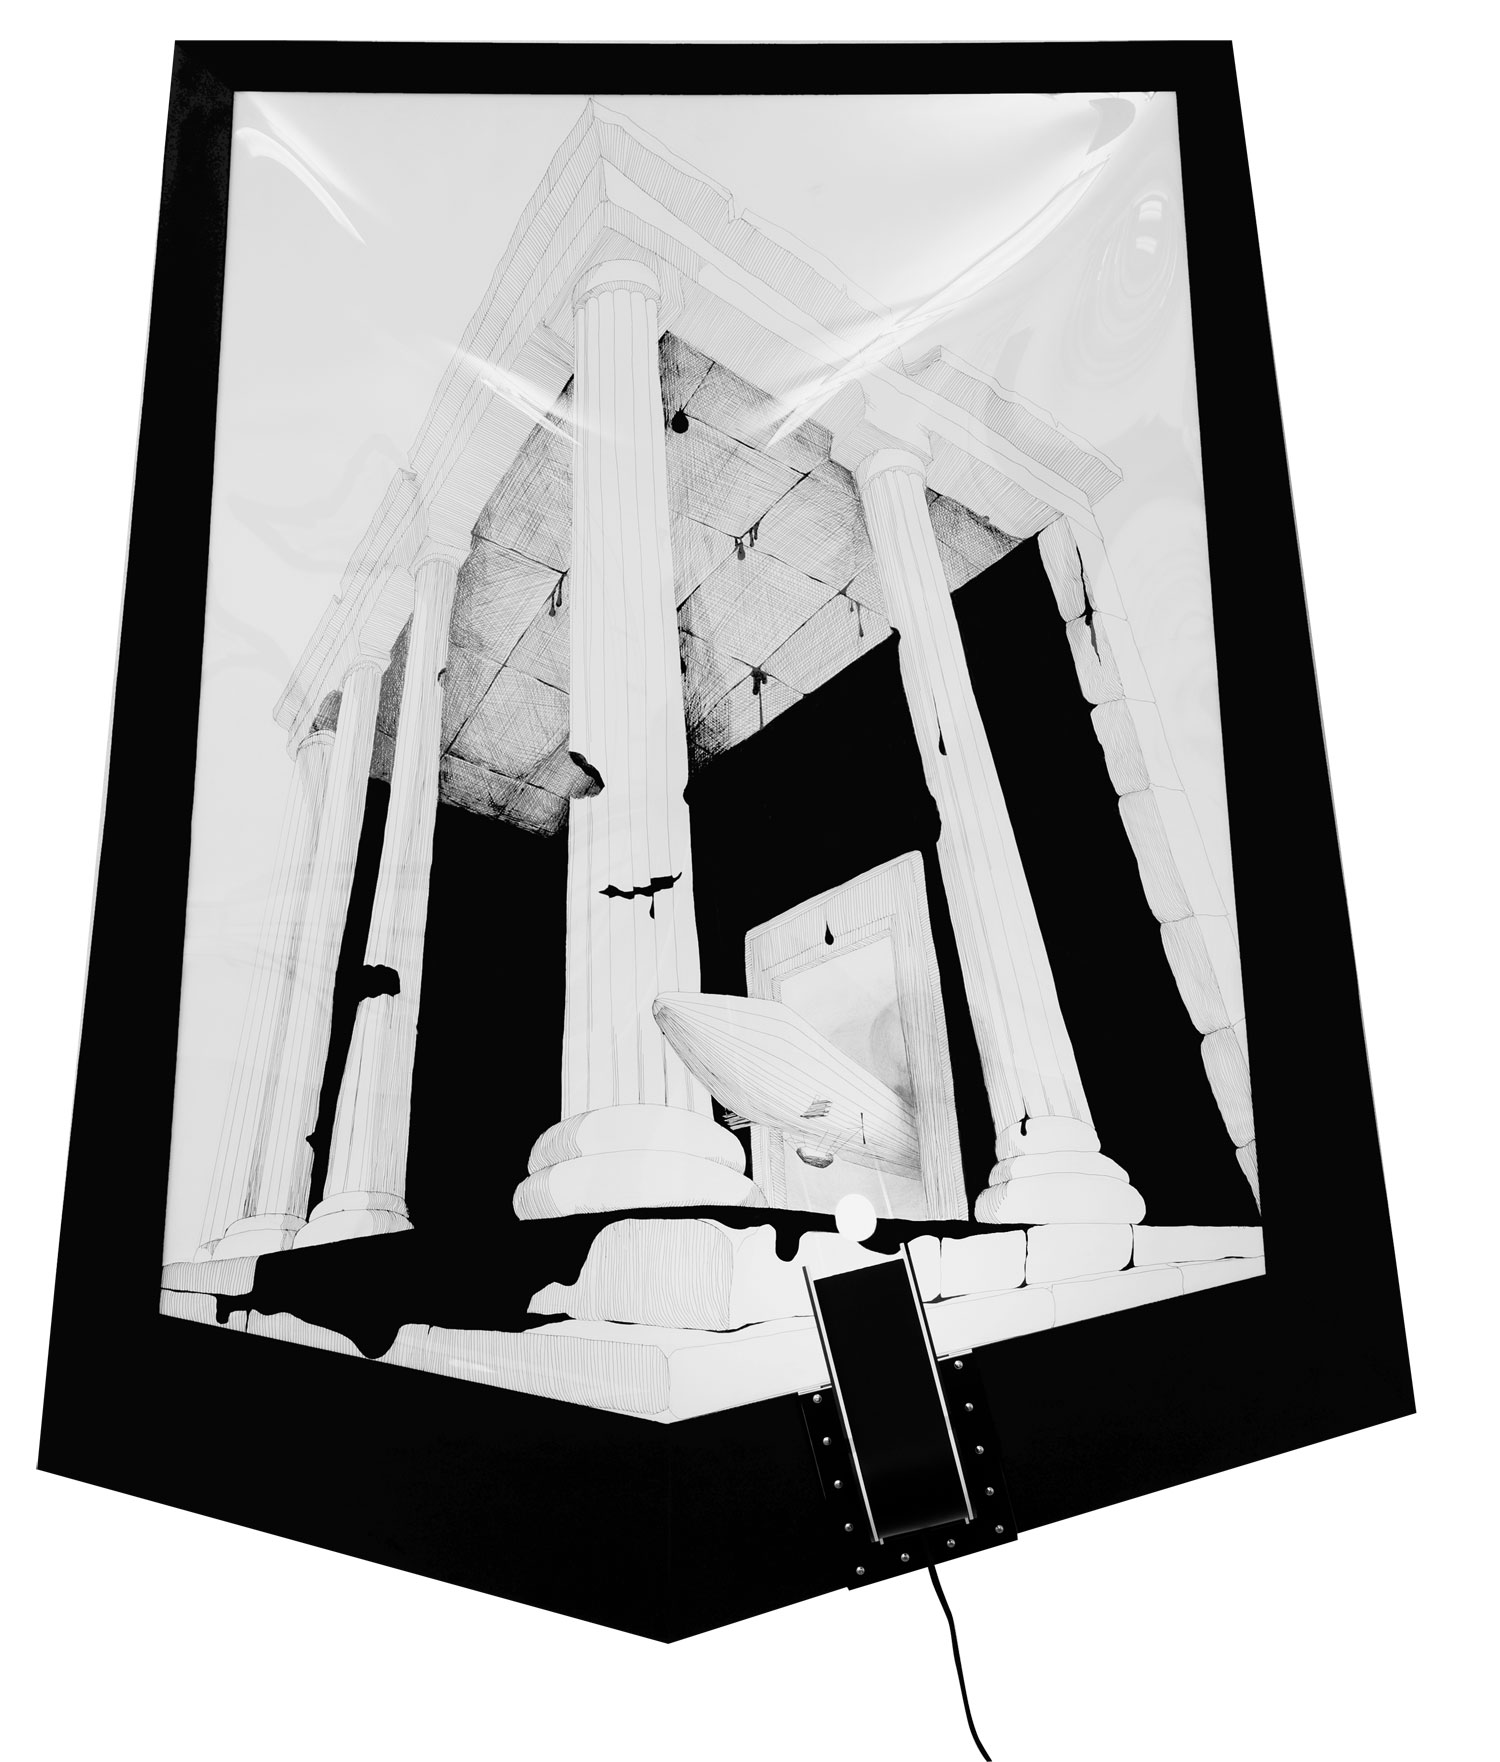 The Biggest Gift, frame design Sylvia Jokelová